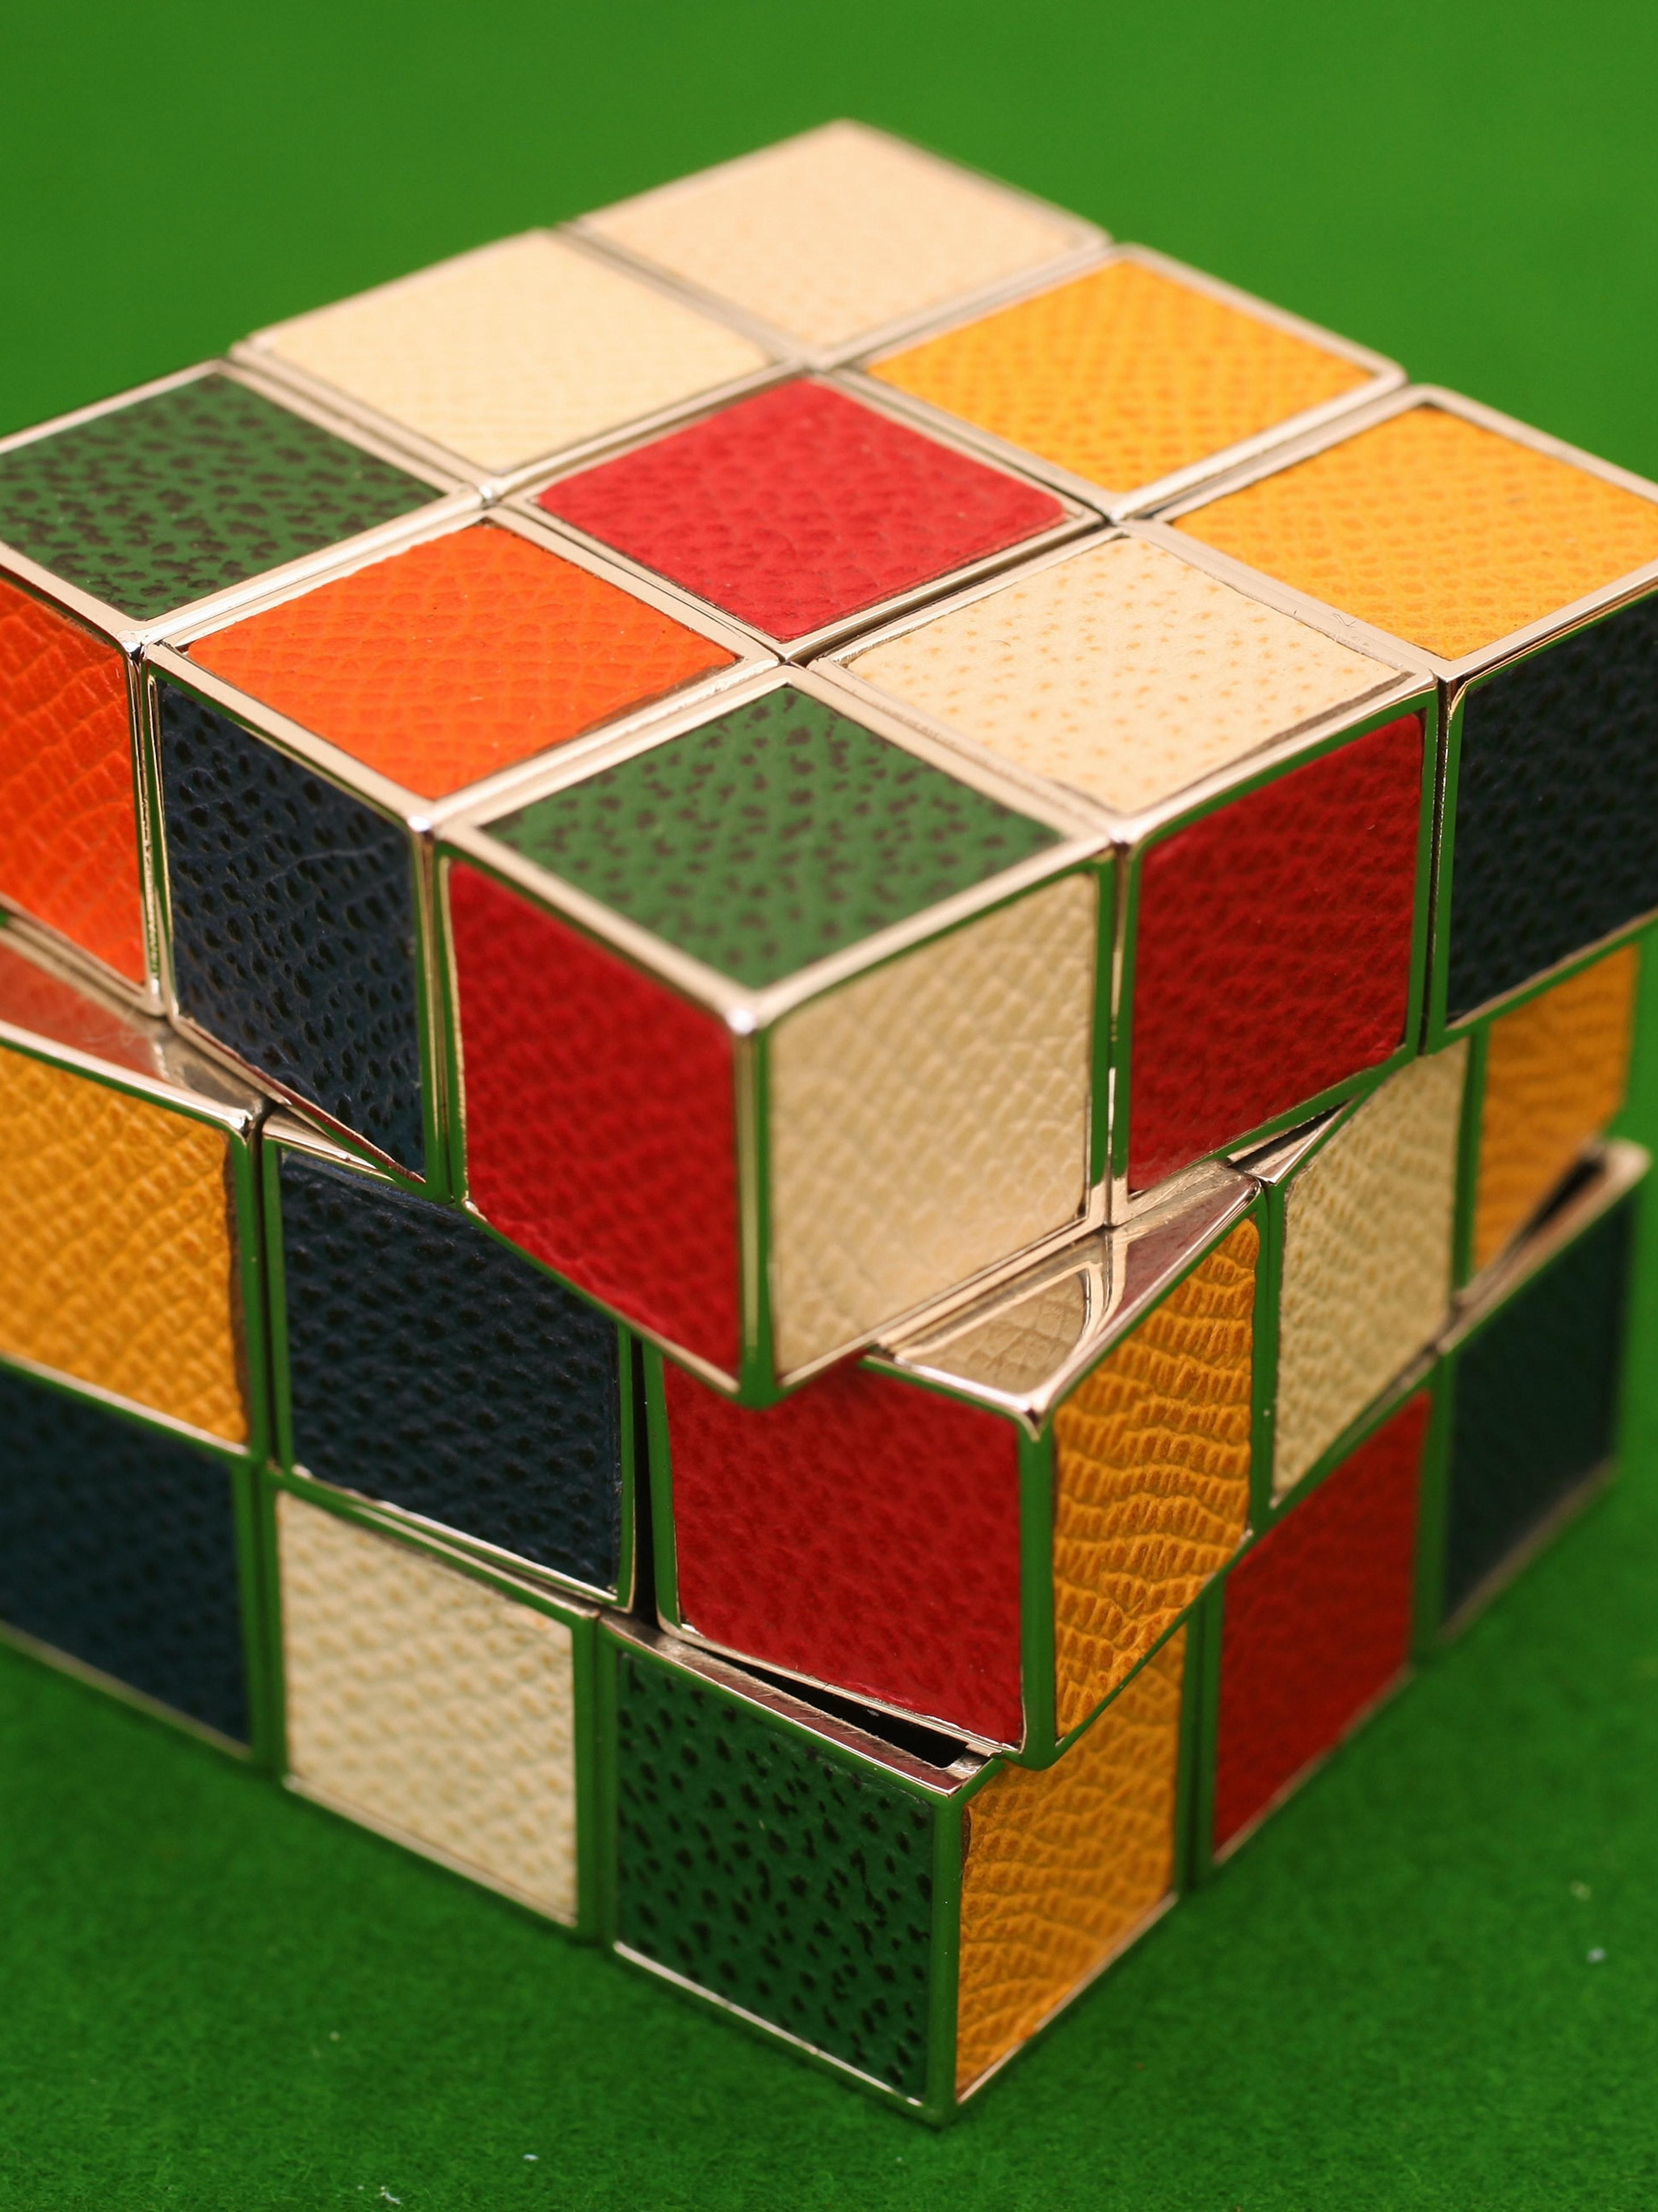 Adam Cheyer, the man behind Siri and Viv, started programming because of the Rubik's Cube.